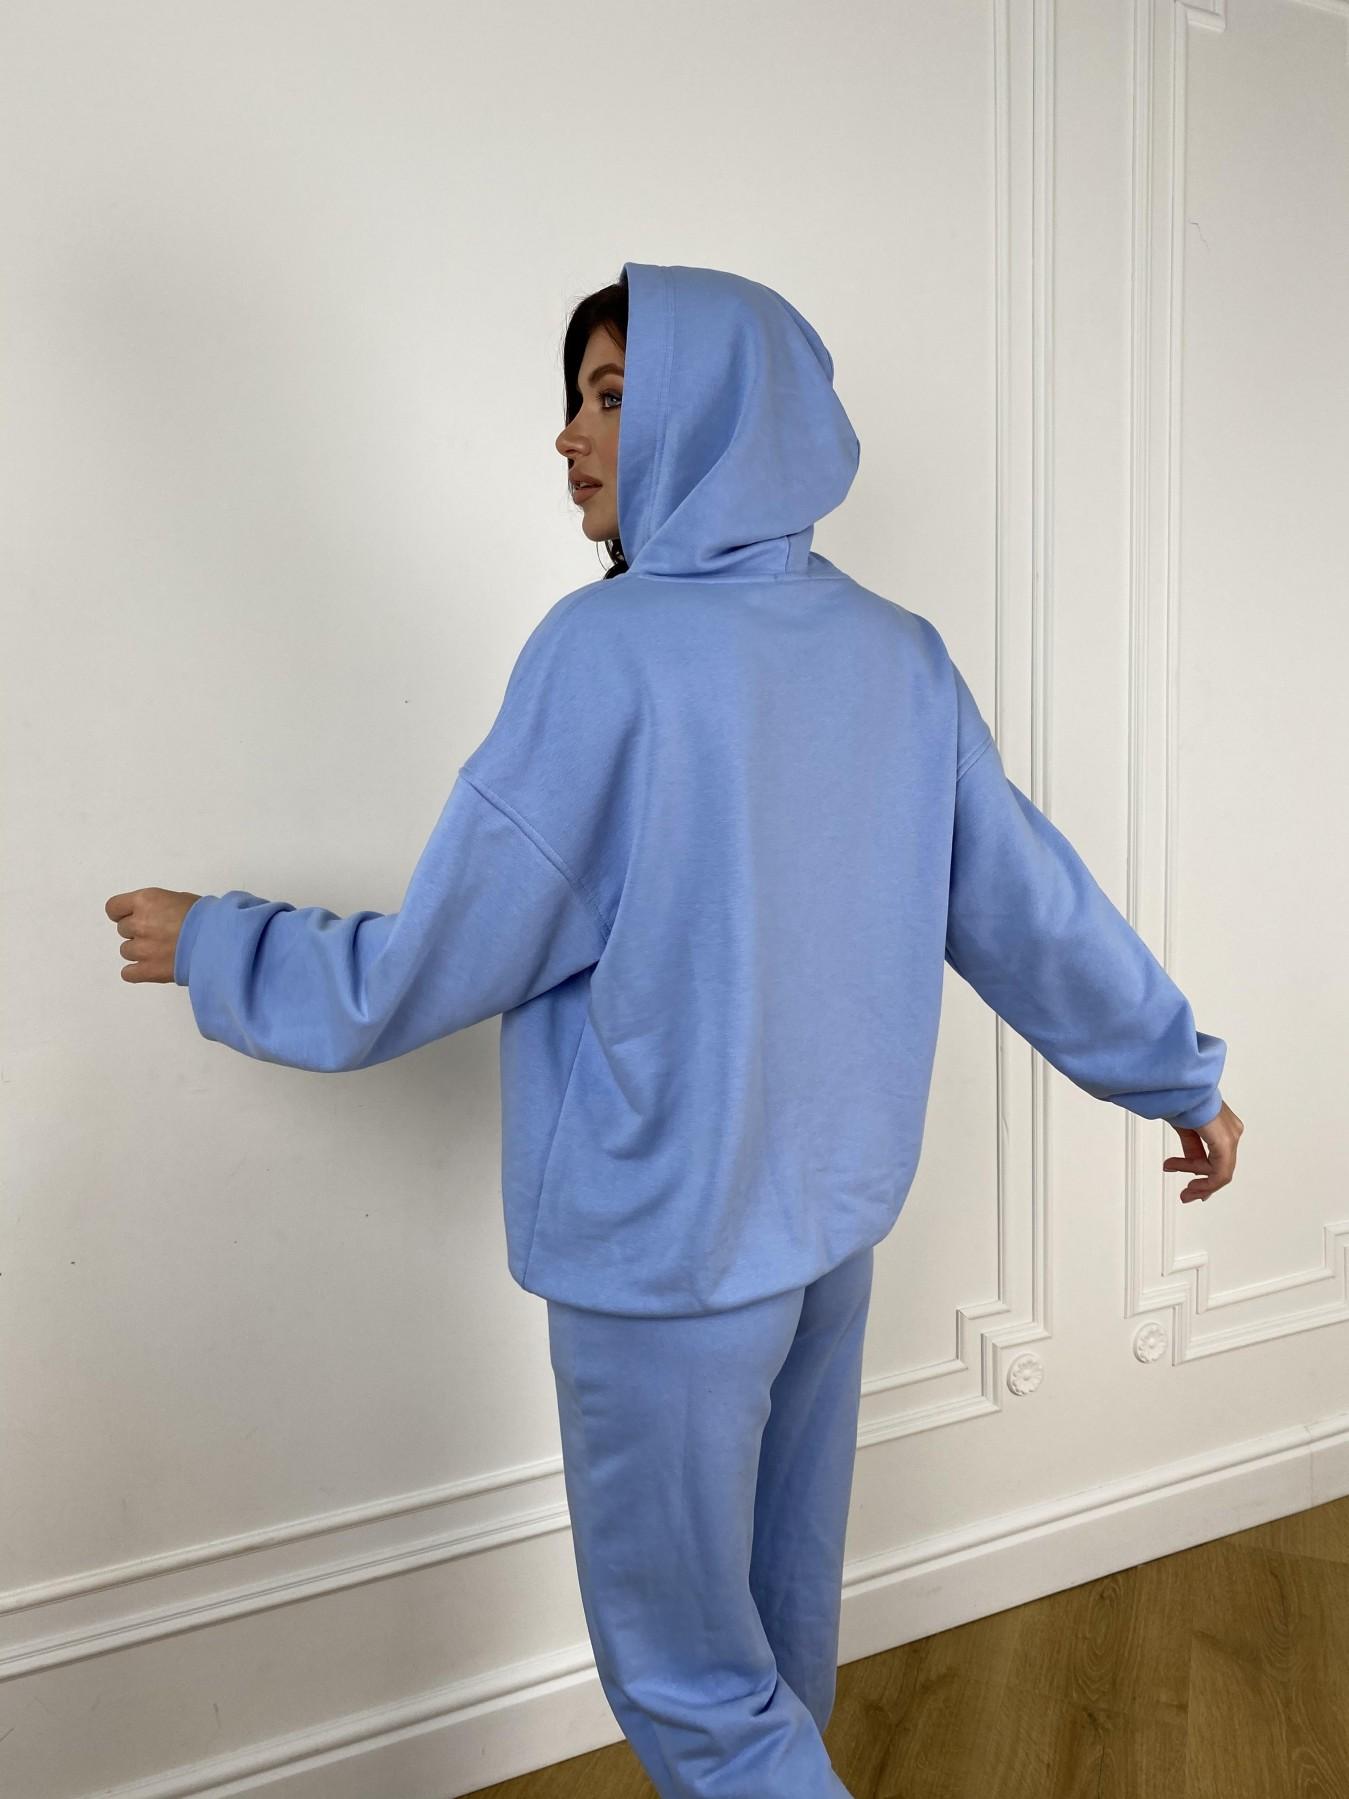 Марион костюм из 3х нитки 10581 АРТ. 46937 Цвет: Голубой - фото 6, интернет магазин tm-modus.ru